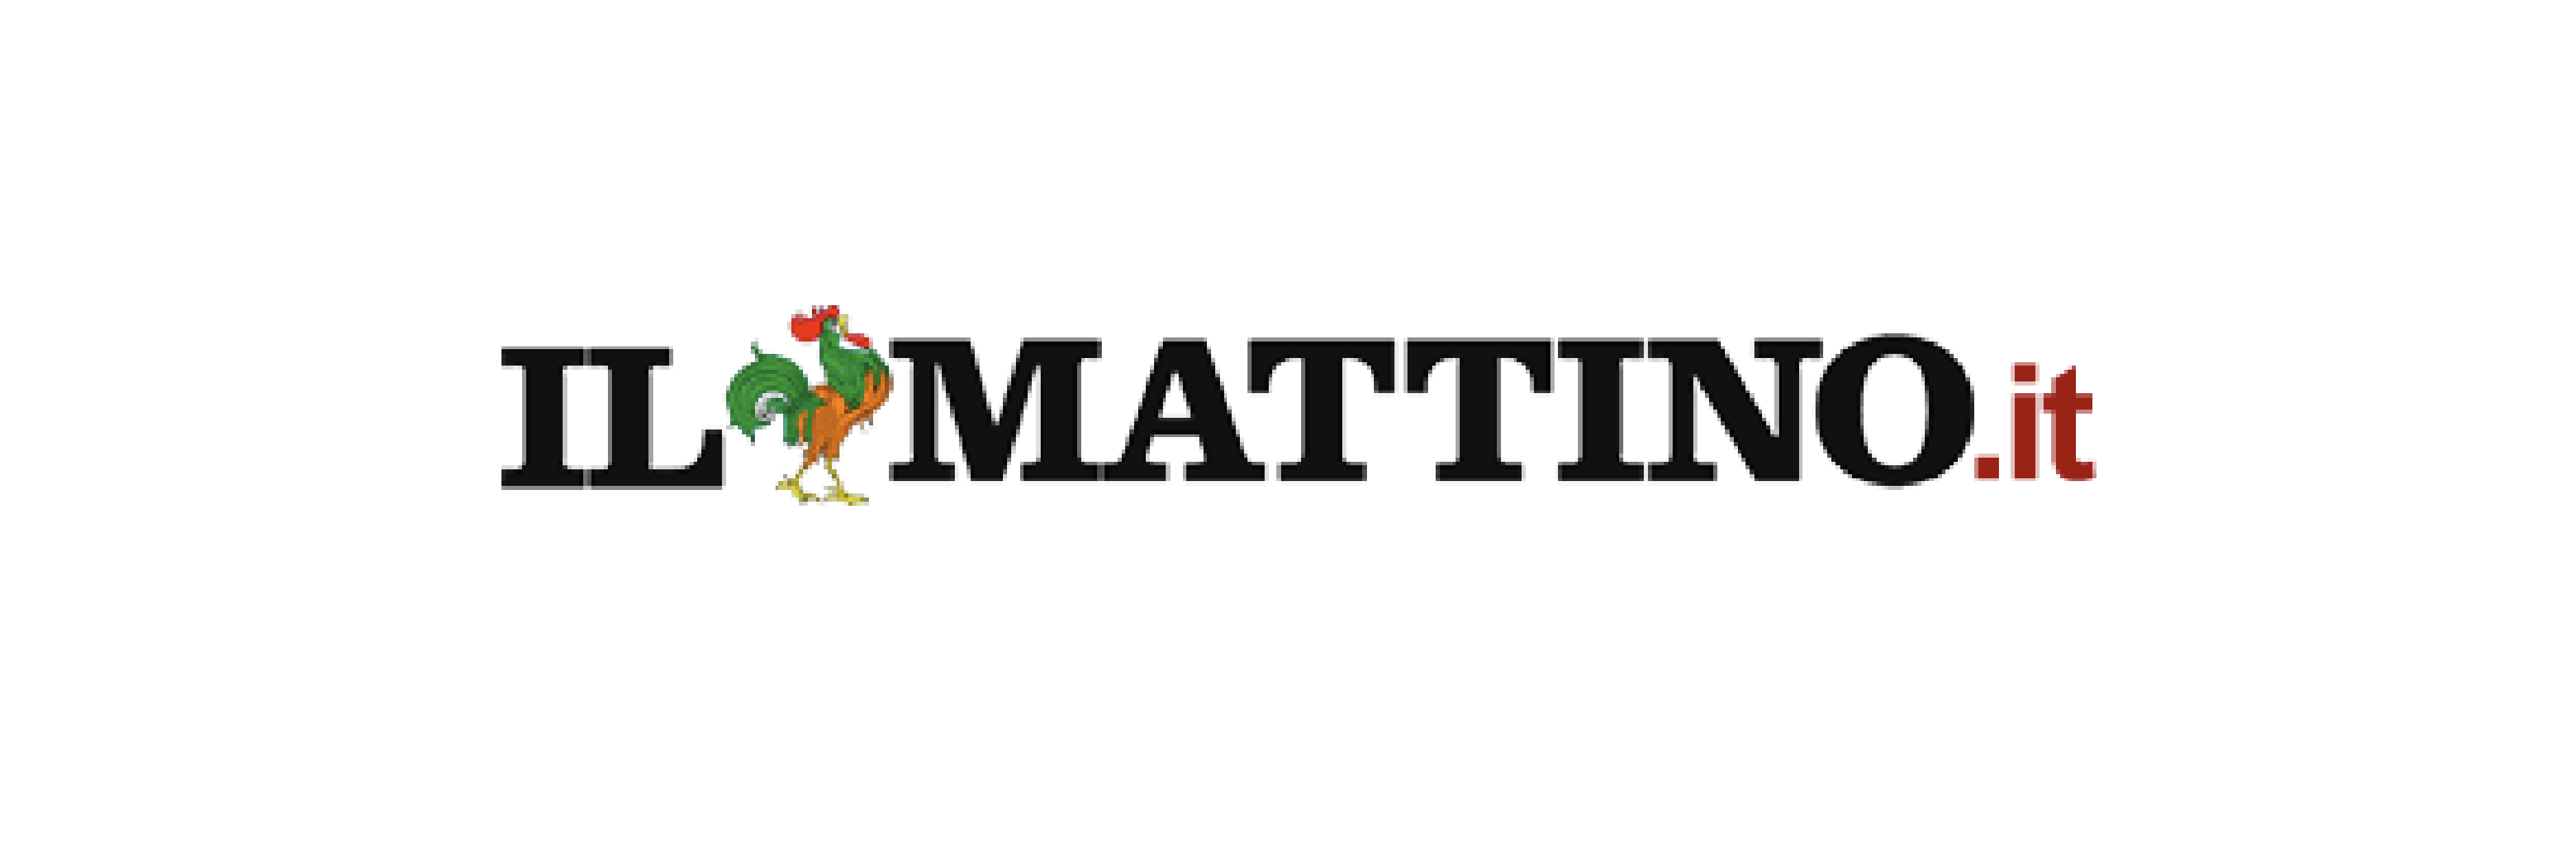 ilmattino.it_logo